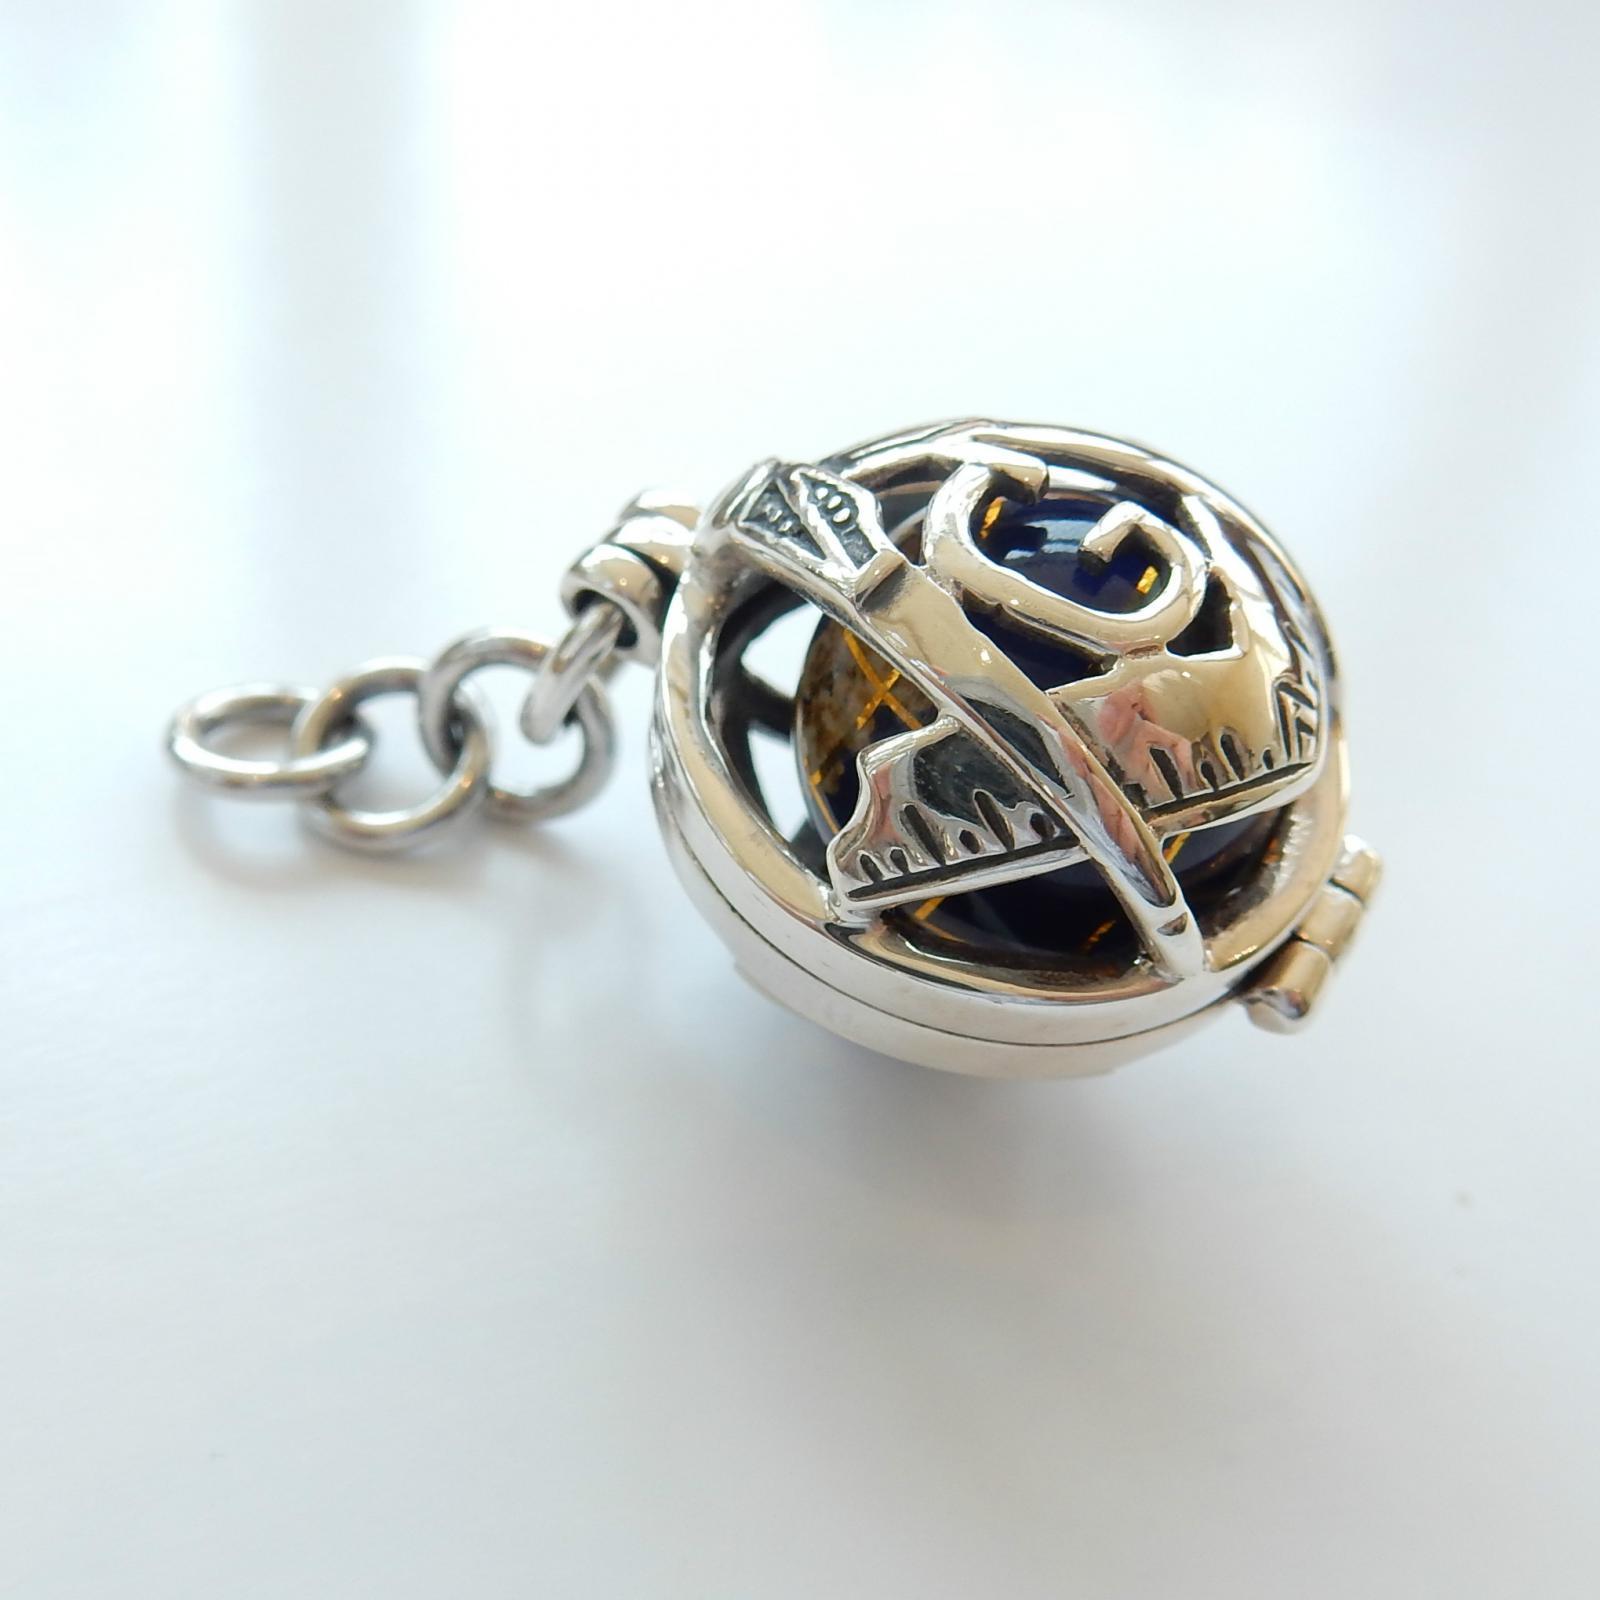 Photo of Sterling Silver Masonic World Globe Fob